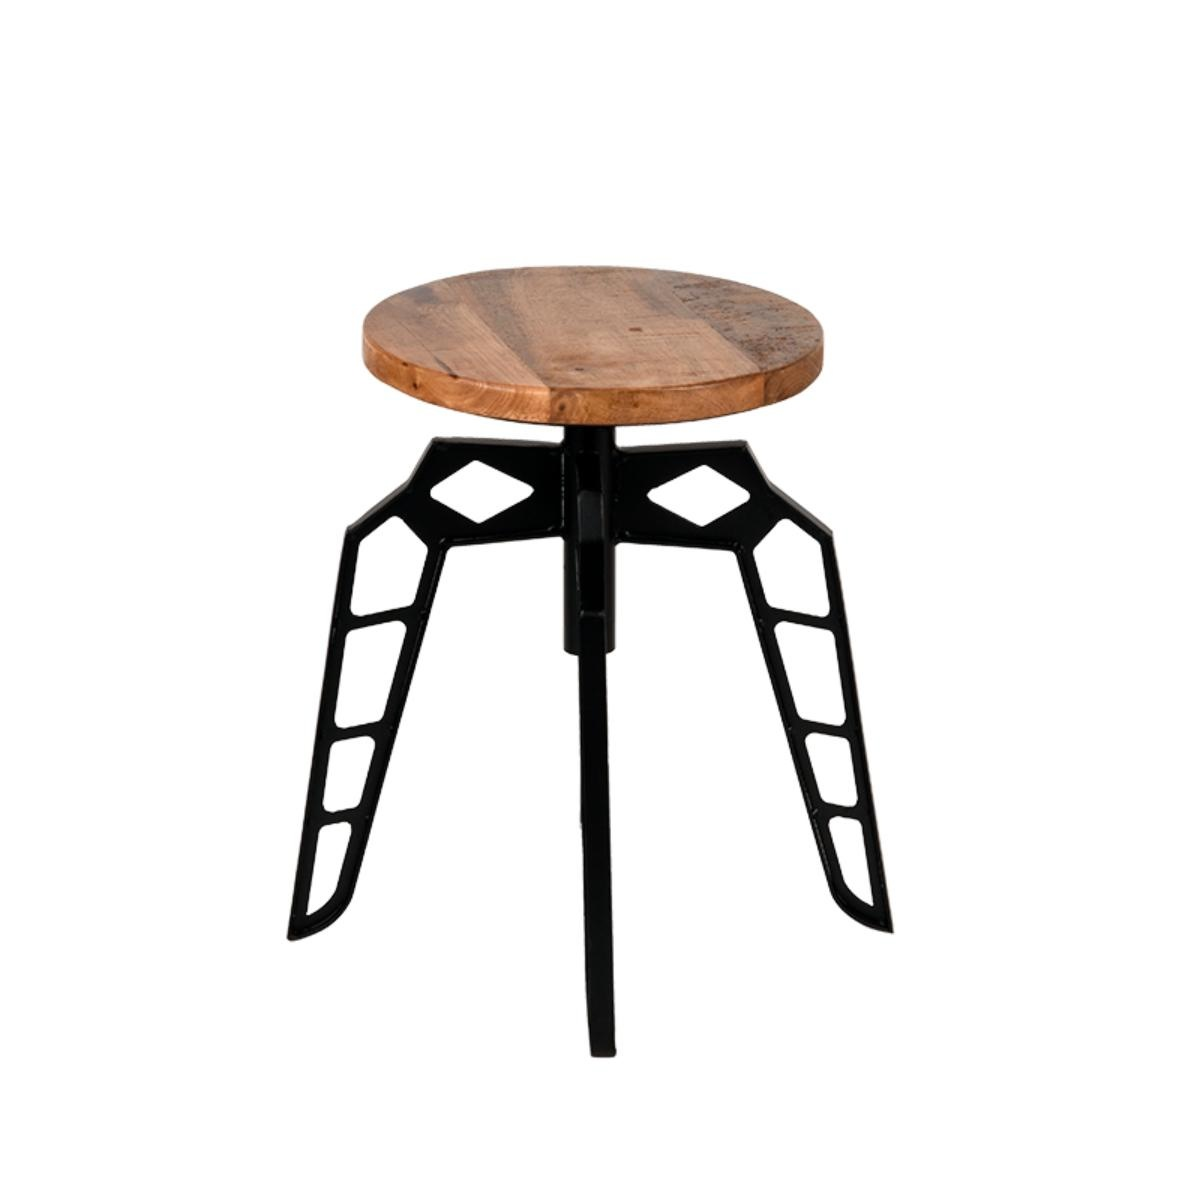 Kruk Pebble - Zwart - Mangohout